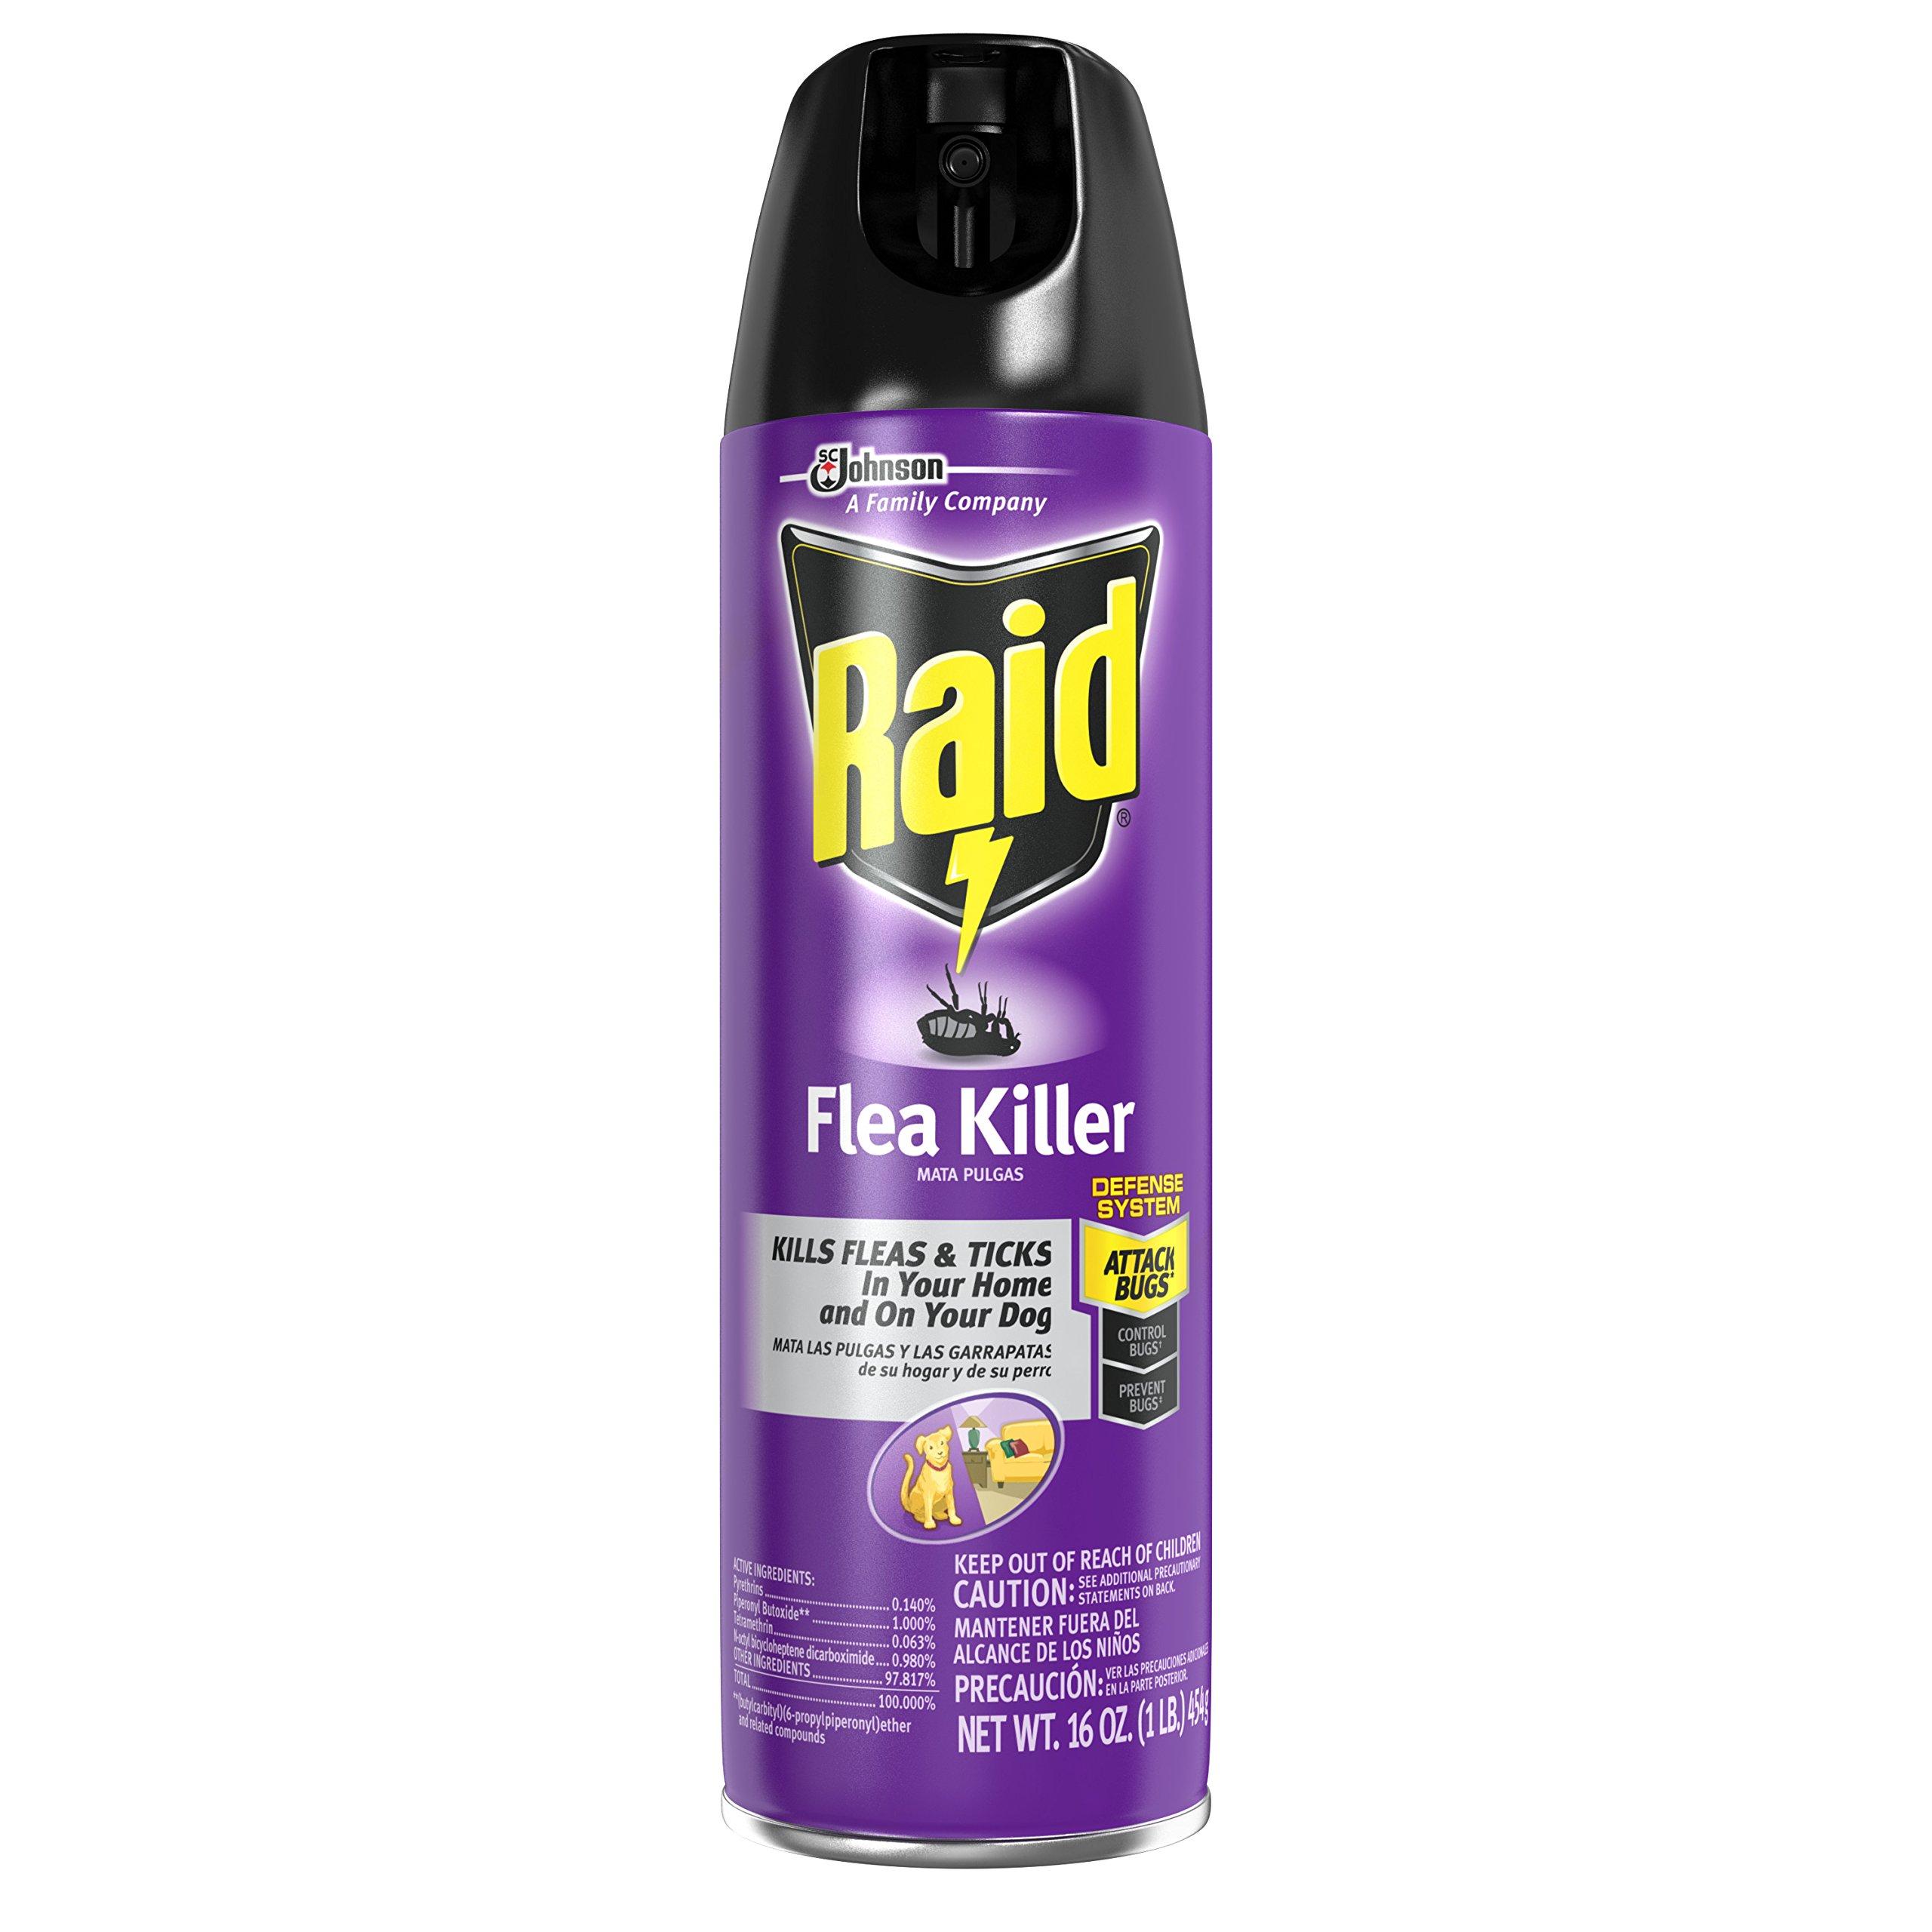 Raid Flea Killer for Home and Dogs, 16 Ounce, 6 Pack